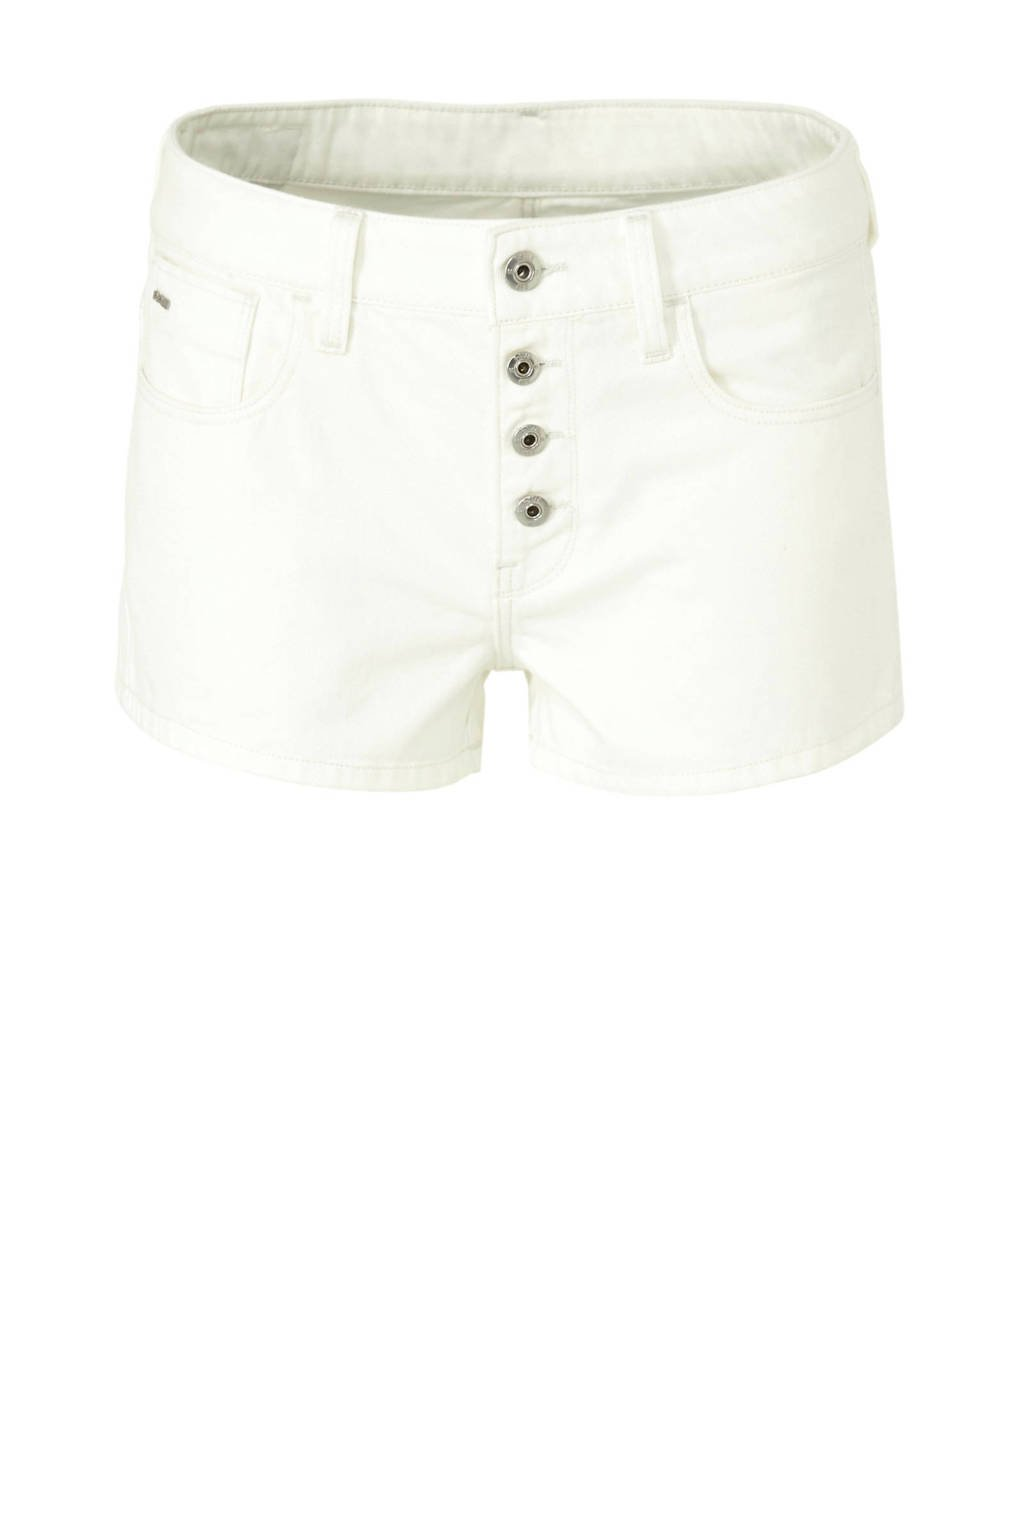 G-Star RAW slim fit jeans short, Ecru